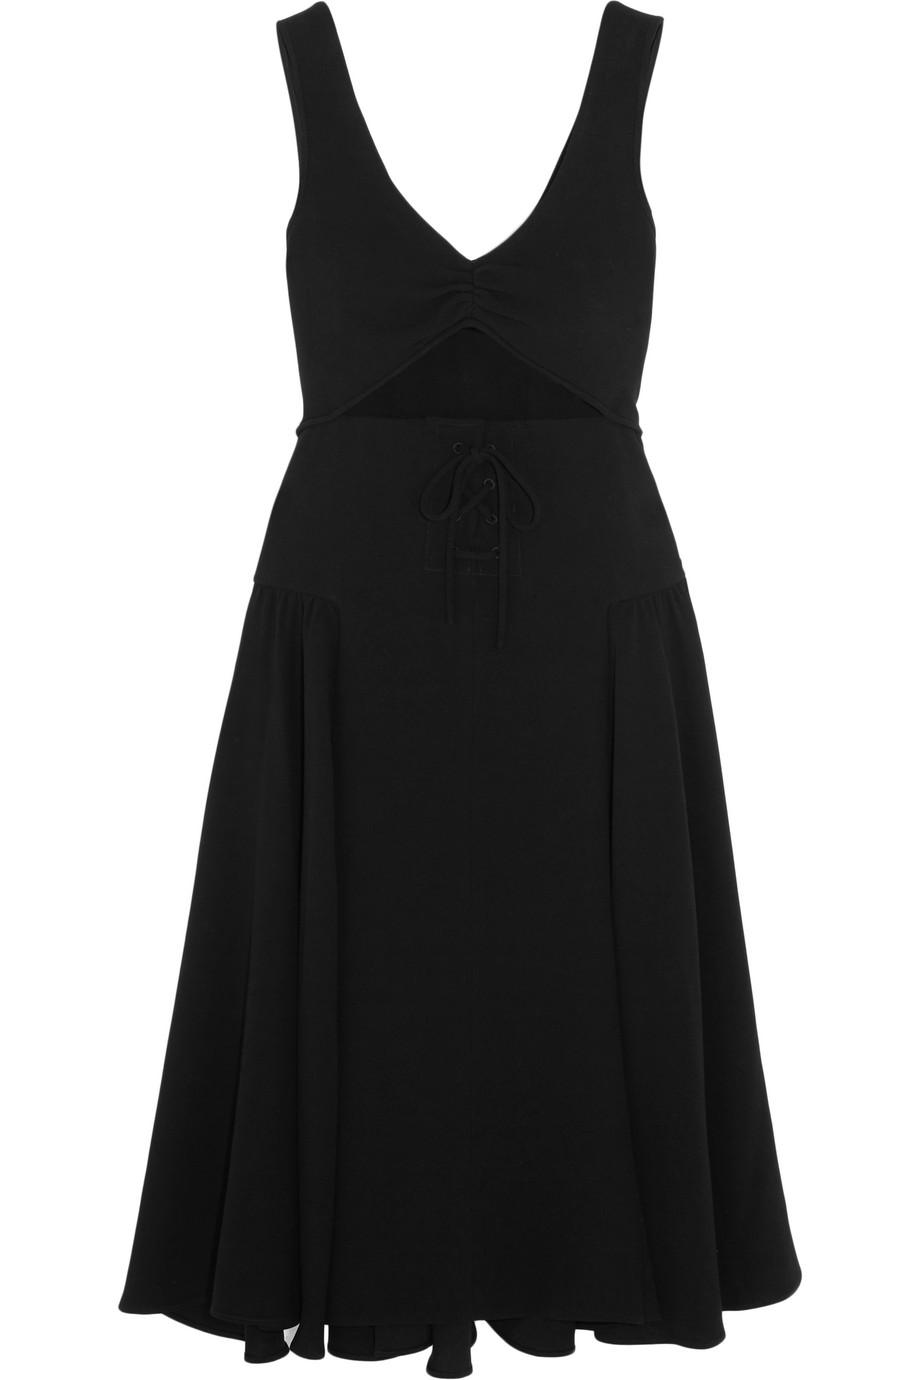 J.W.Anderson Cutout Crepe Dress, Size: 8